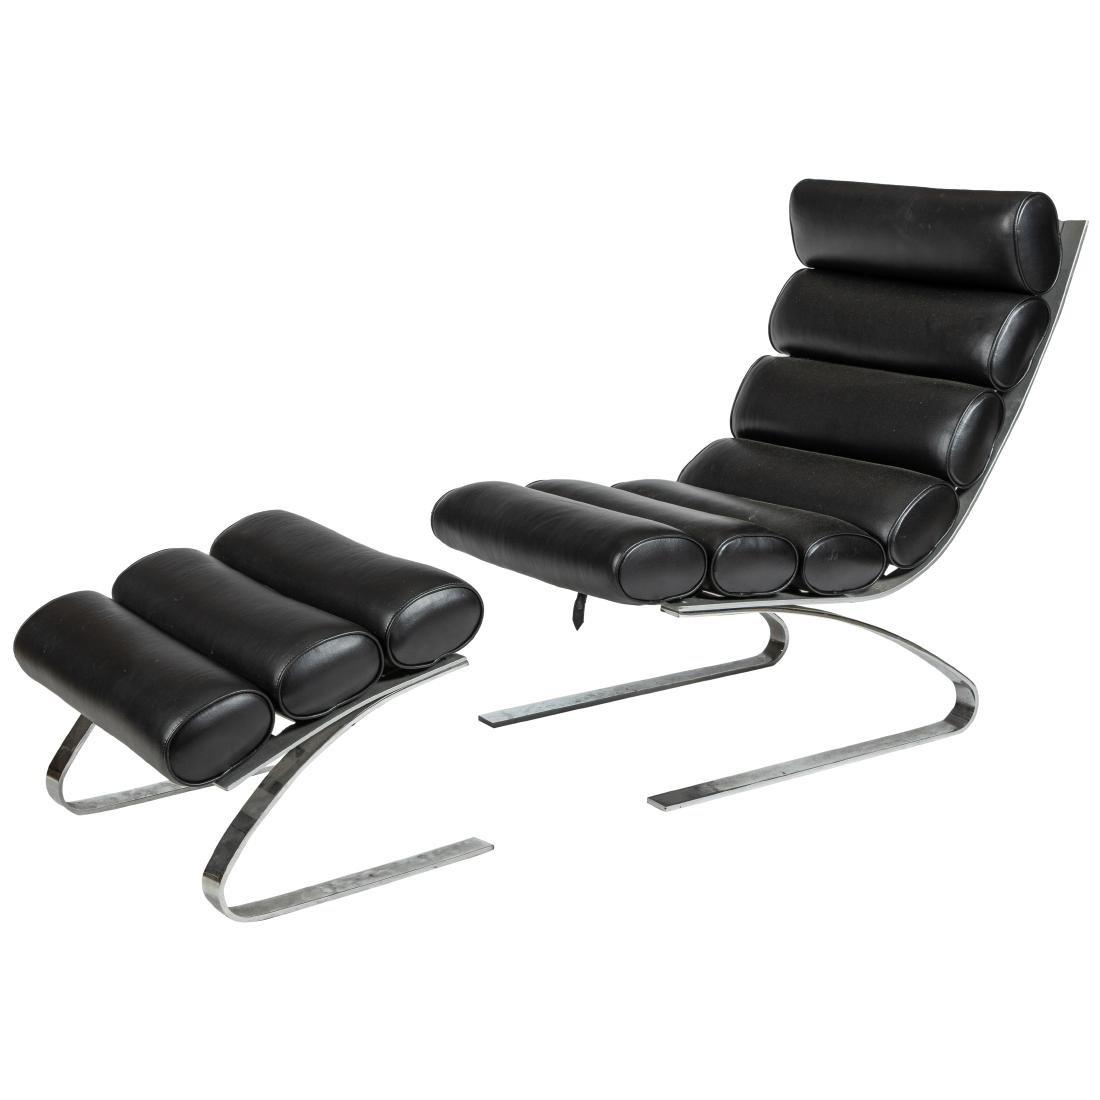 DIA - Cantilever Lounge Chair & Ottoman